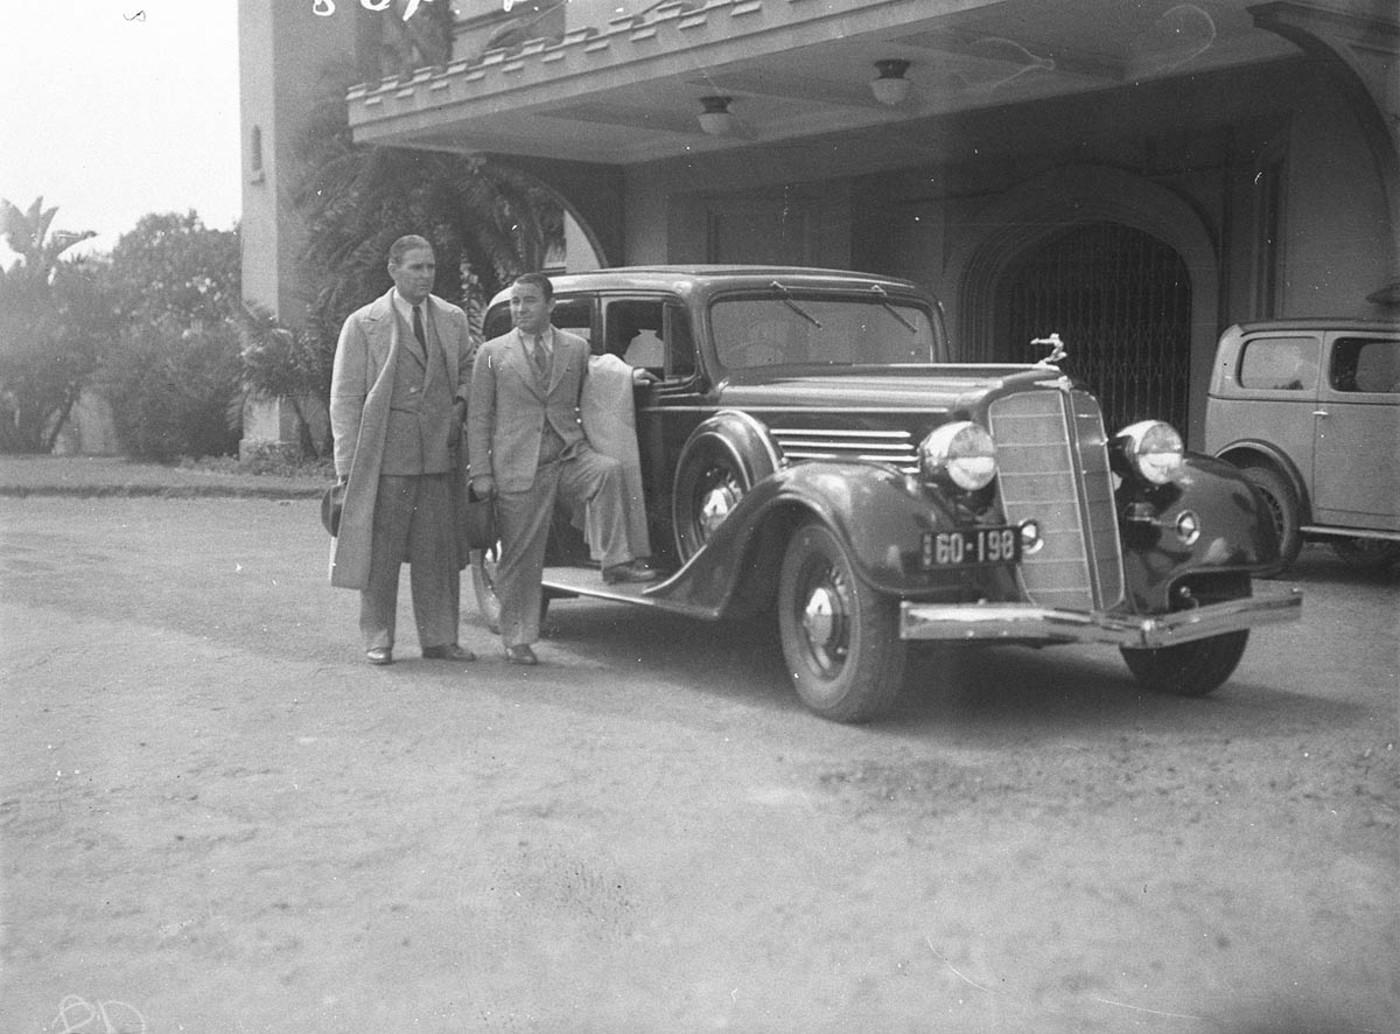 File:SLNSW 42917 Joe Kirkwood and friend and 1932 Buick outside ...